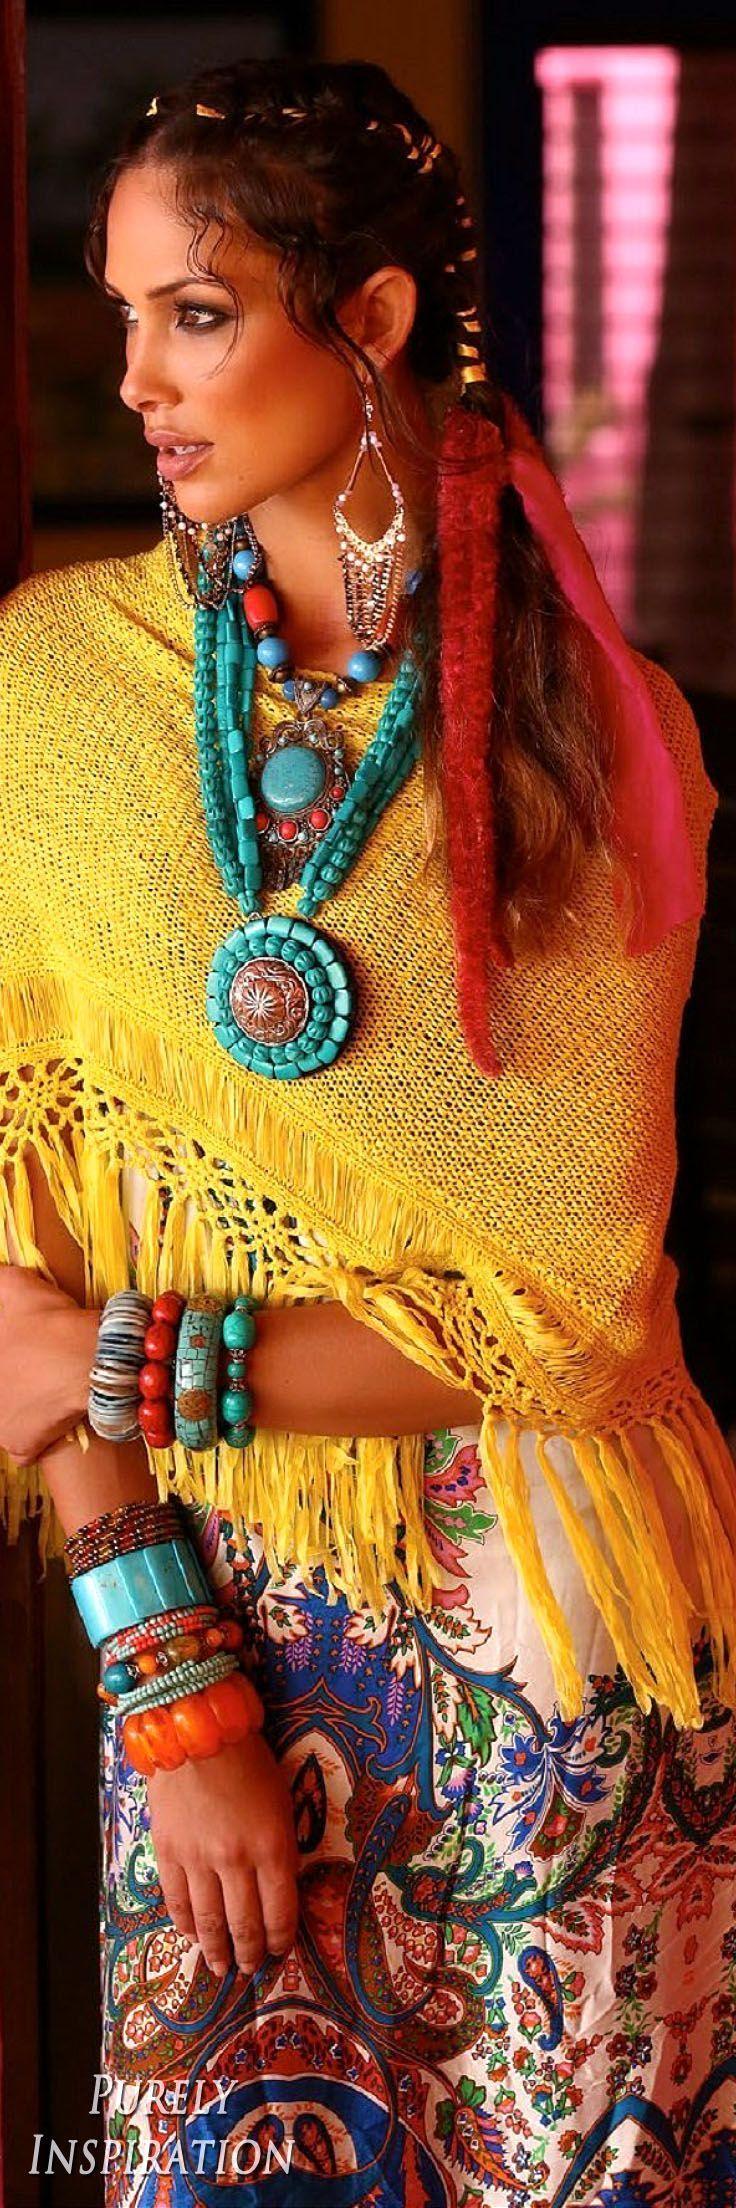 best 25 hippie clothing ideas on pinterest hippie style. Black Bedroom Furniture Sets. Home Design Ideas